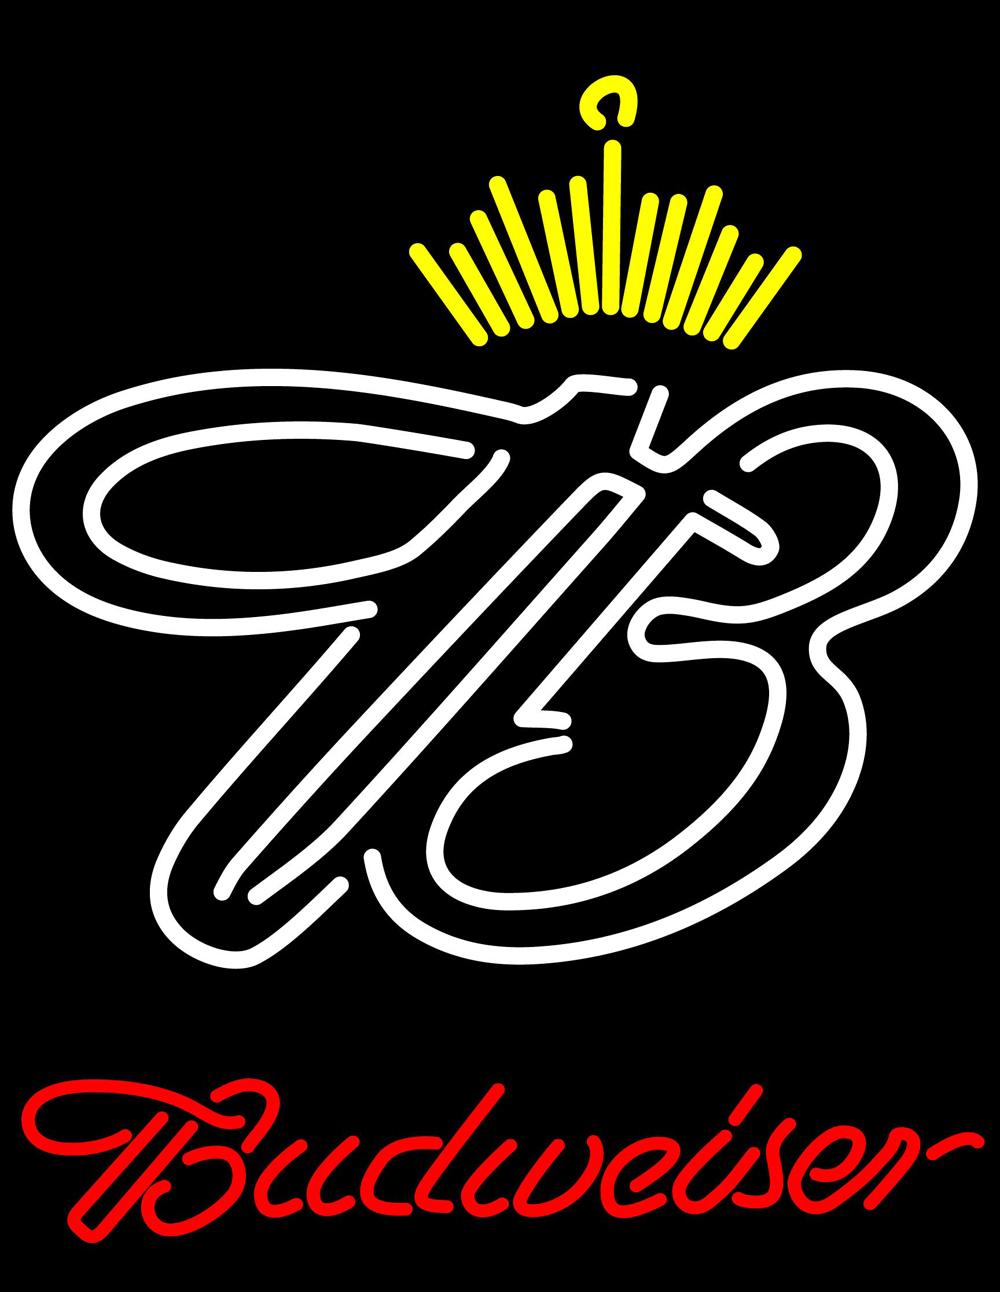 Budweiser crown neon sign 16  x 16